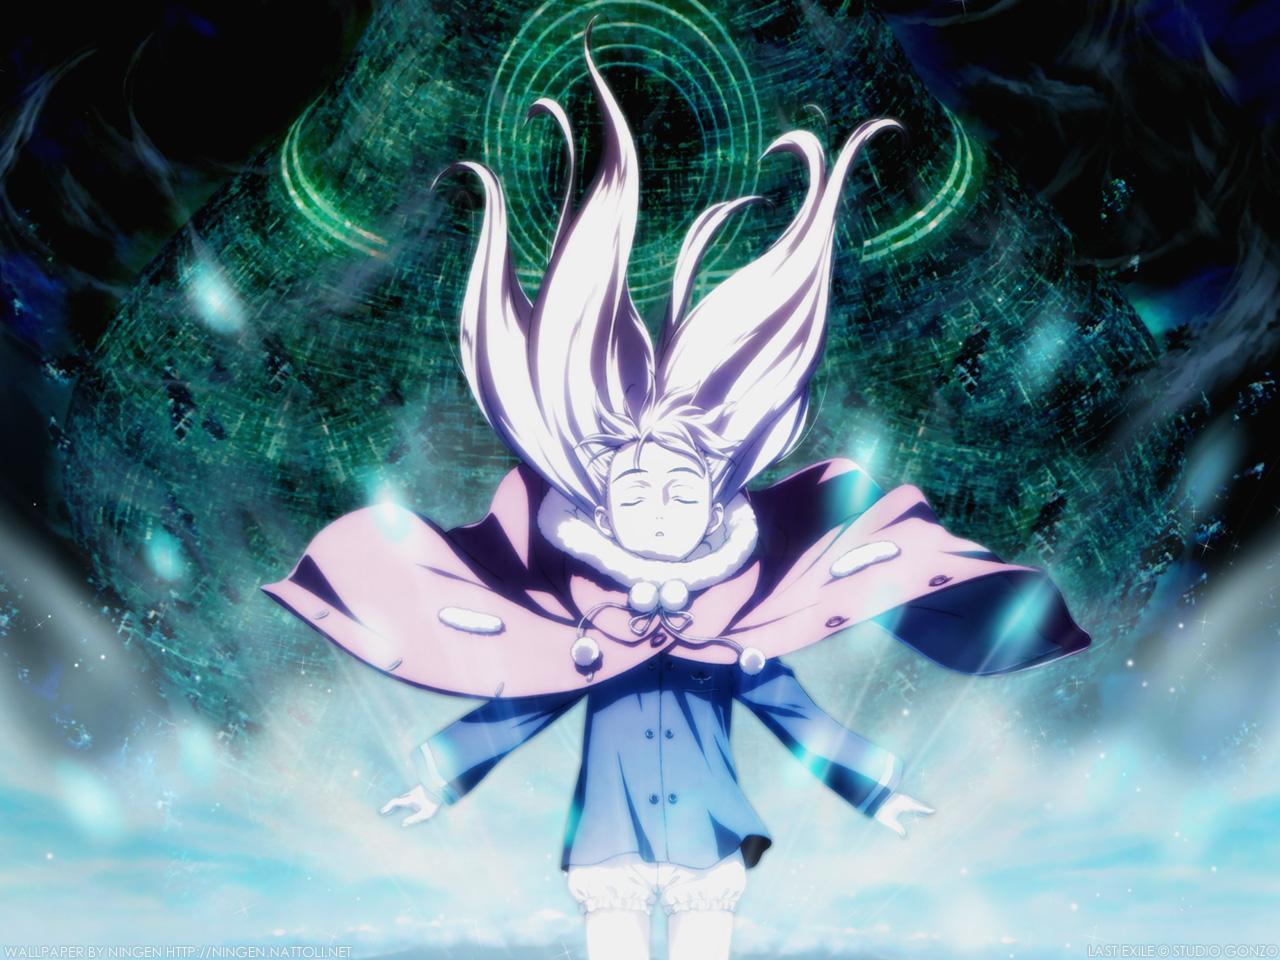 Download Anime Last Exile Wallpaper 1280x960 Wallpoper 1280x960